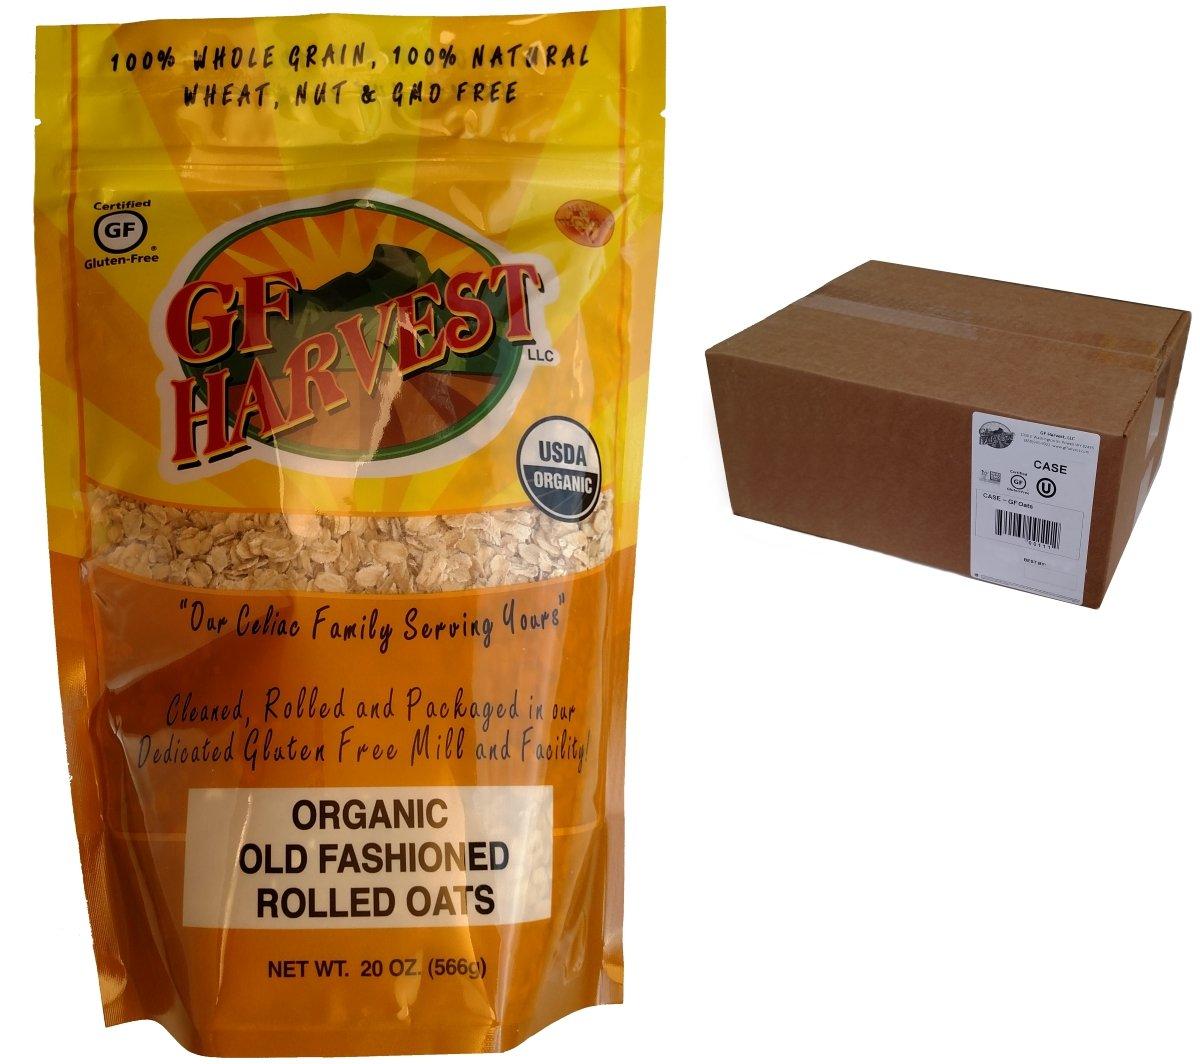 GF Harvest Gluten Free Certified Organic Rolled Oats, Non GMO, 20 oz Bag, Non-GMO, Certified Organic, 6 Count by GF Harvest (Image #1)